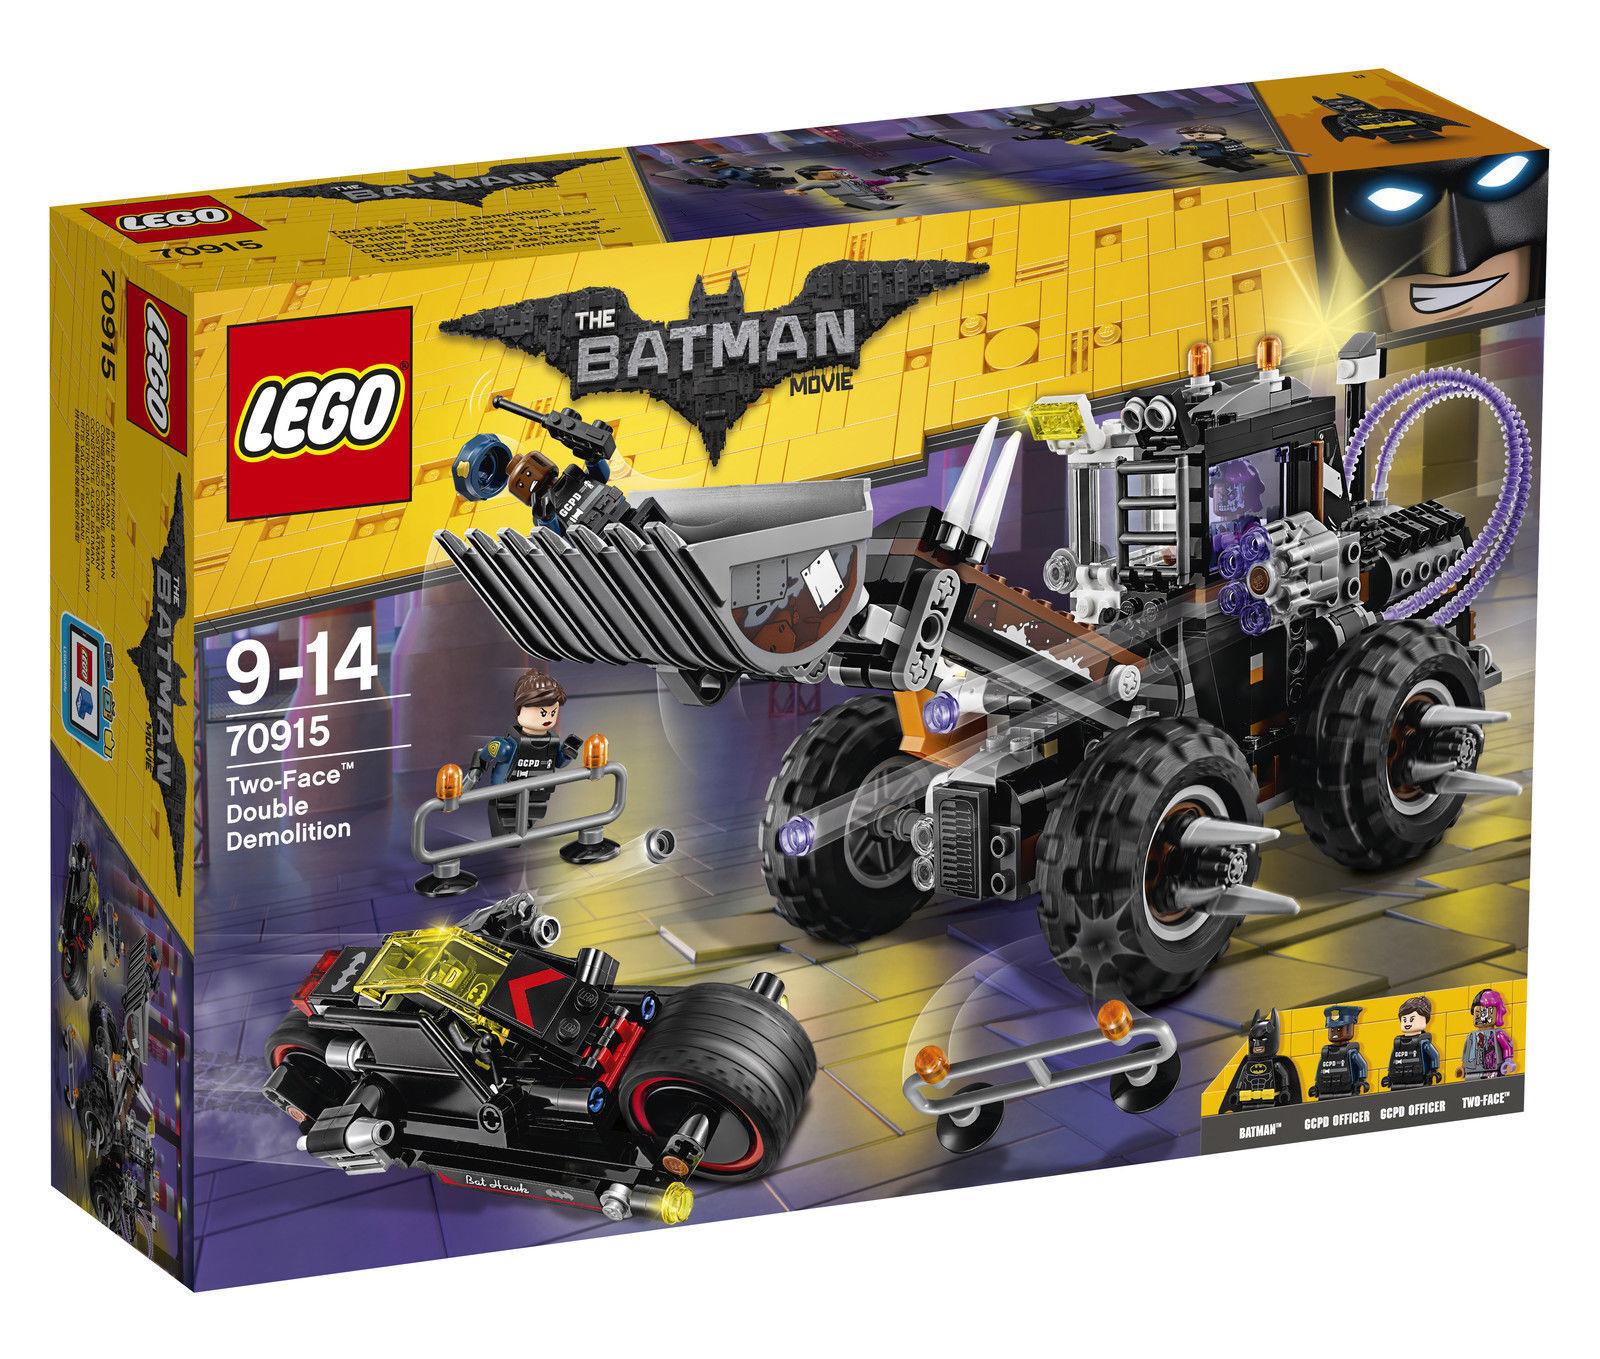 The LEGO Batman Movie Two-Face Double Demolition 70915 New Sealed RetiROT Rare